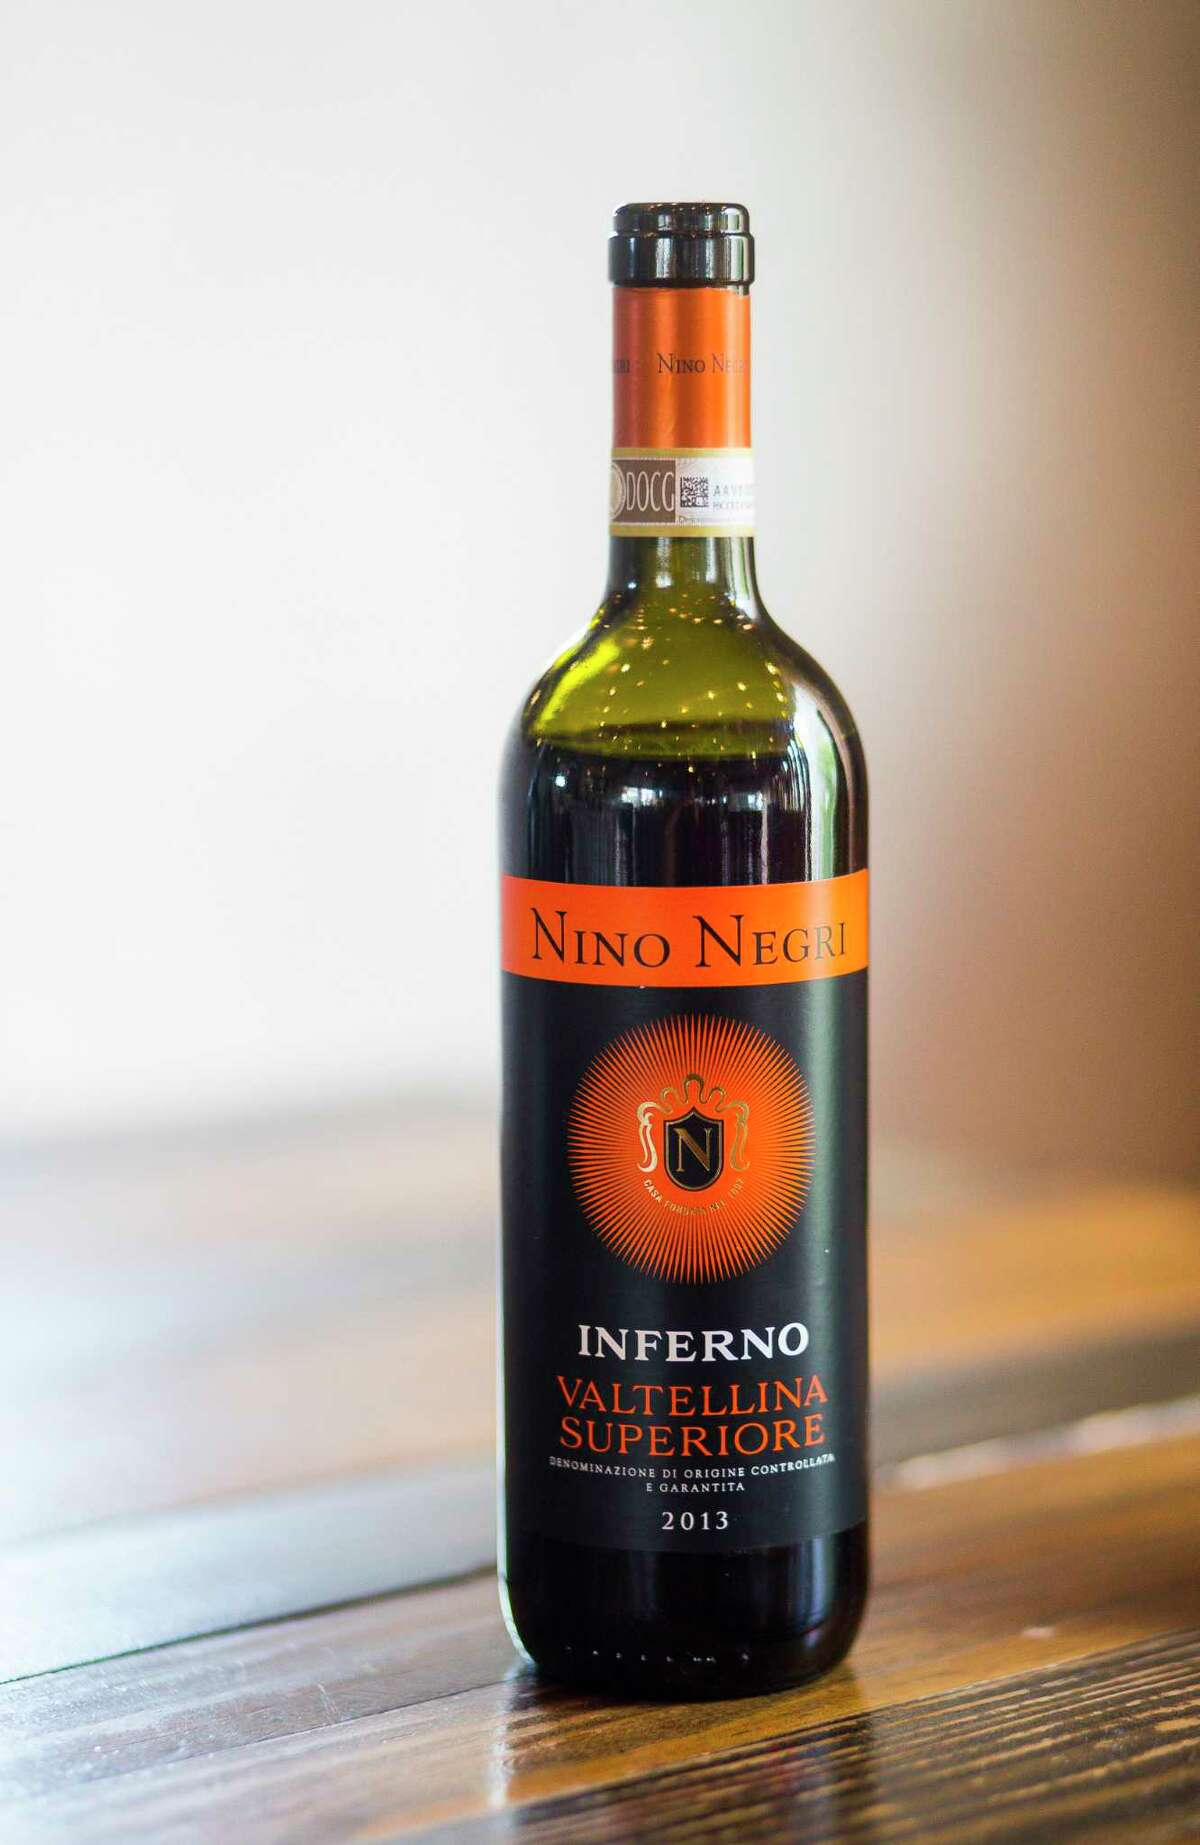 2013 Nino Negri Inferno, Valtellina Superiore DOCG